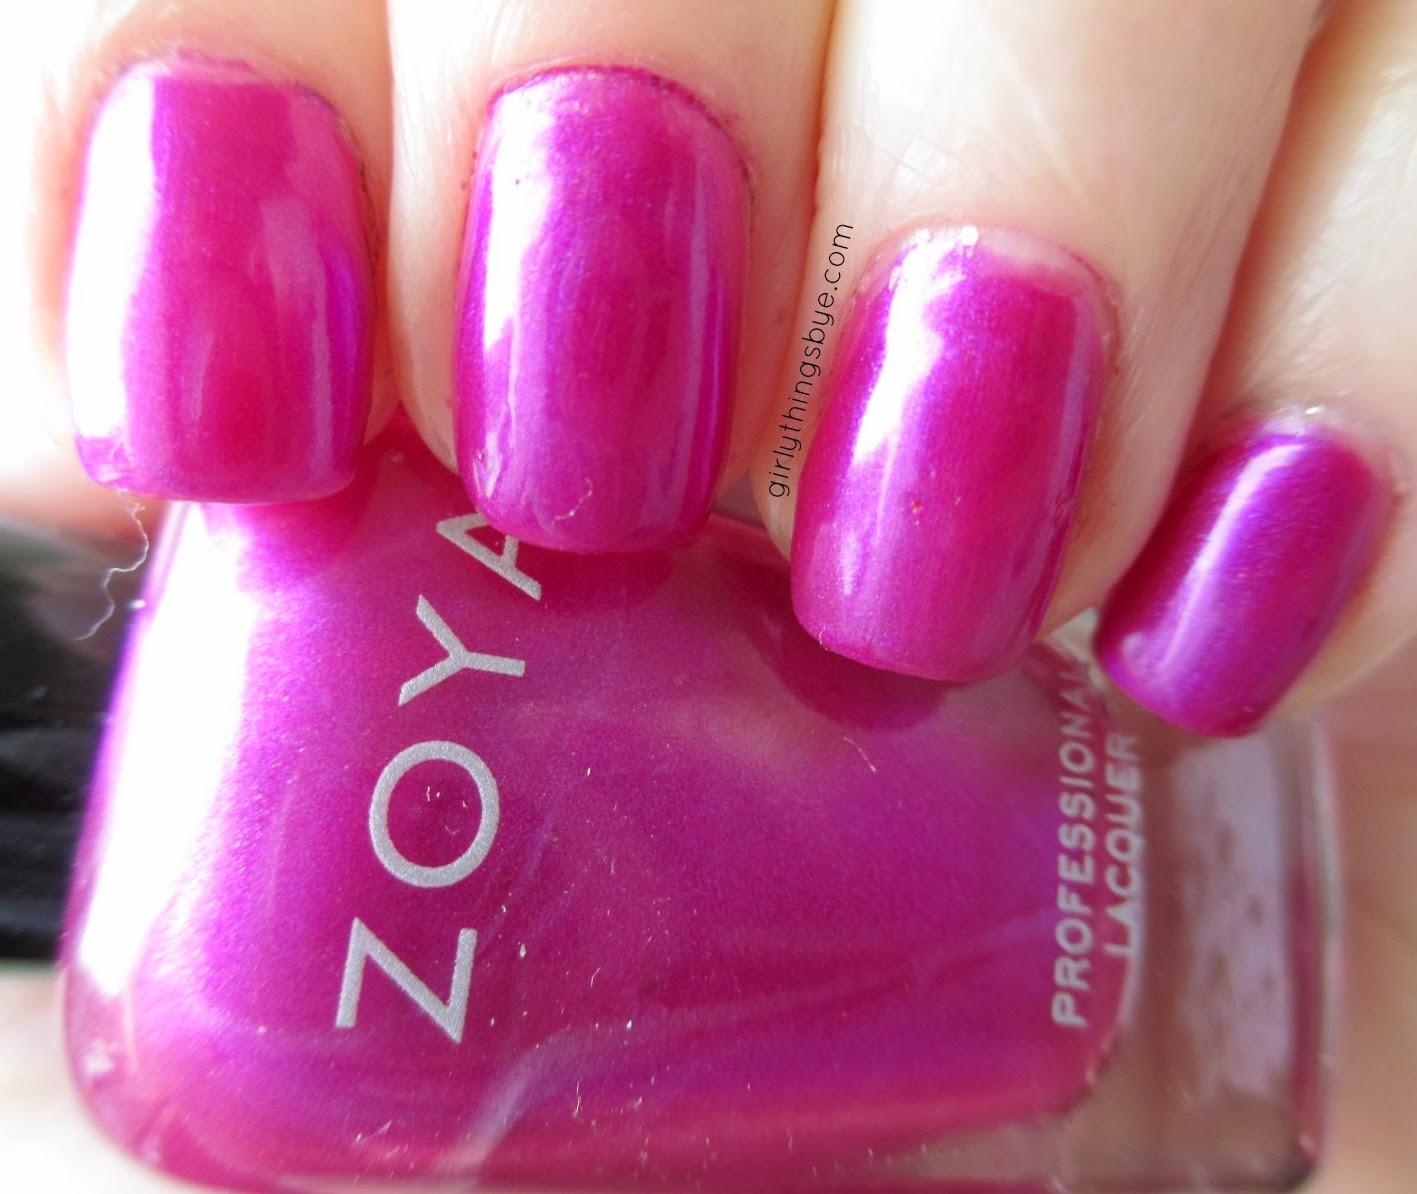 Zoya Blyss, swatch, radiant orchid, nail polish, @girlythingsby_e